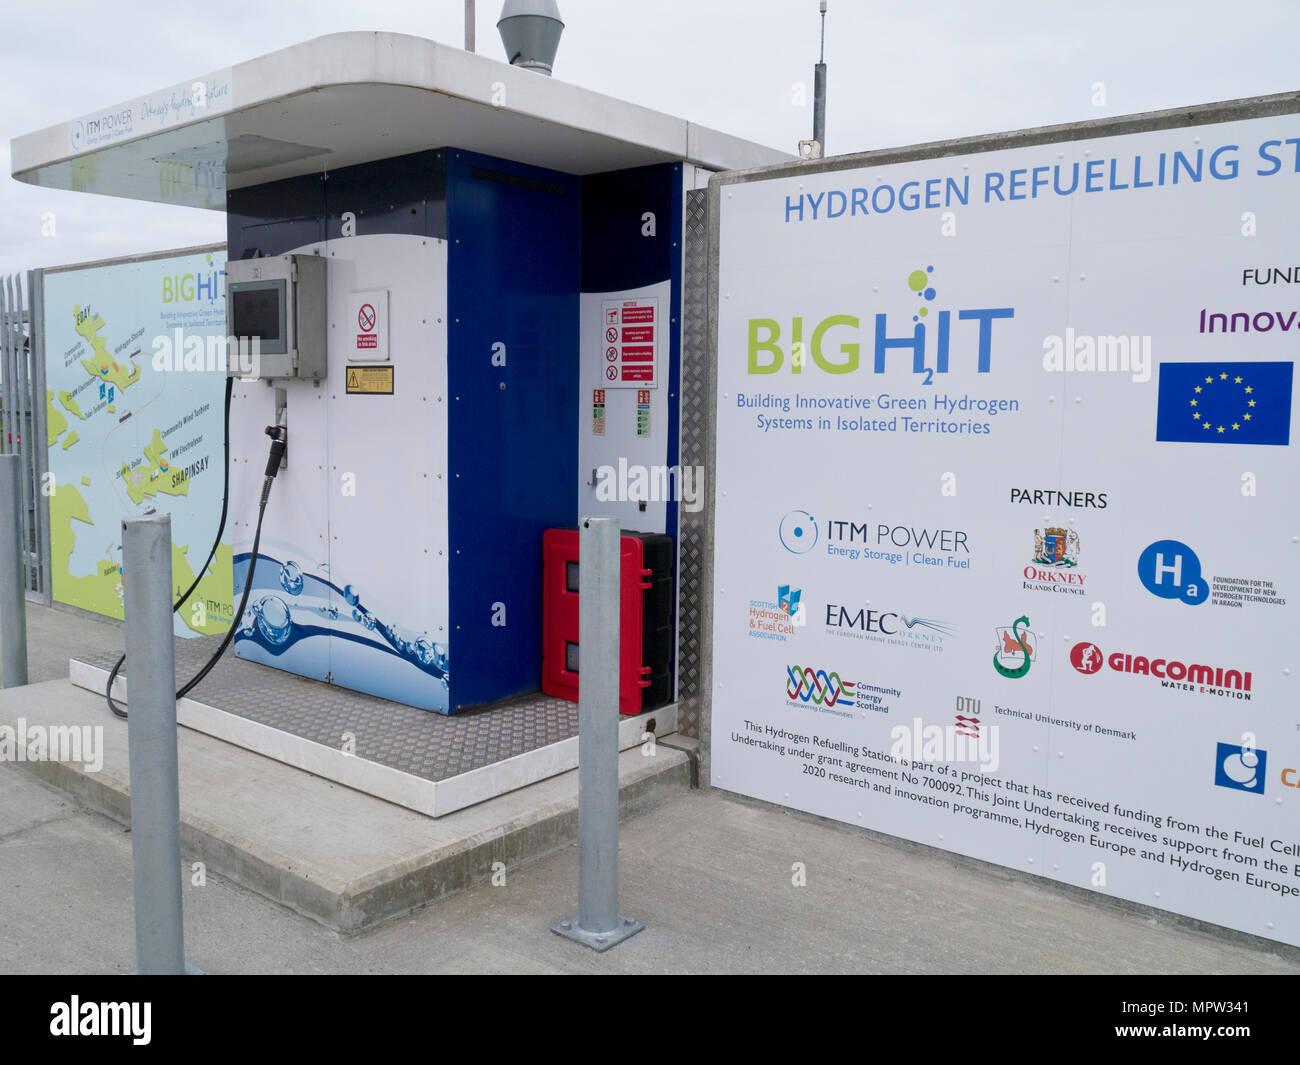 Hydrogen Refuelling Station in Kirkwall, Orkney Isles - Stock Image